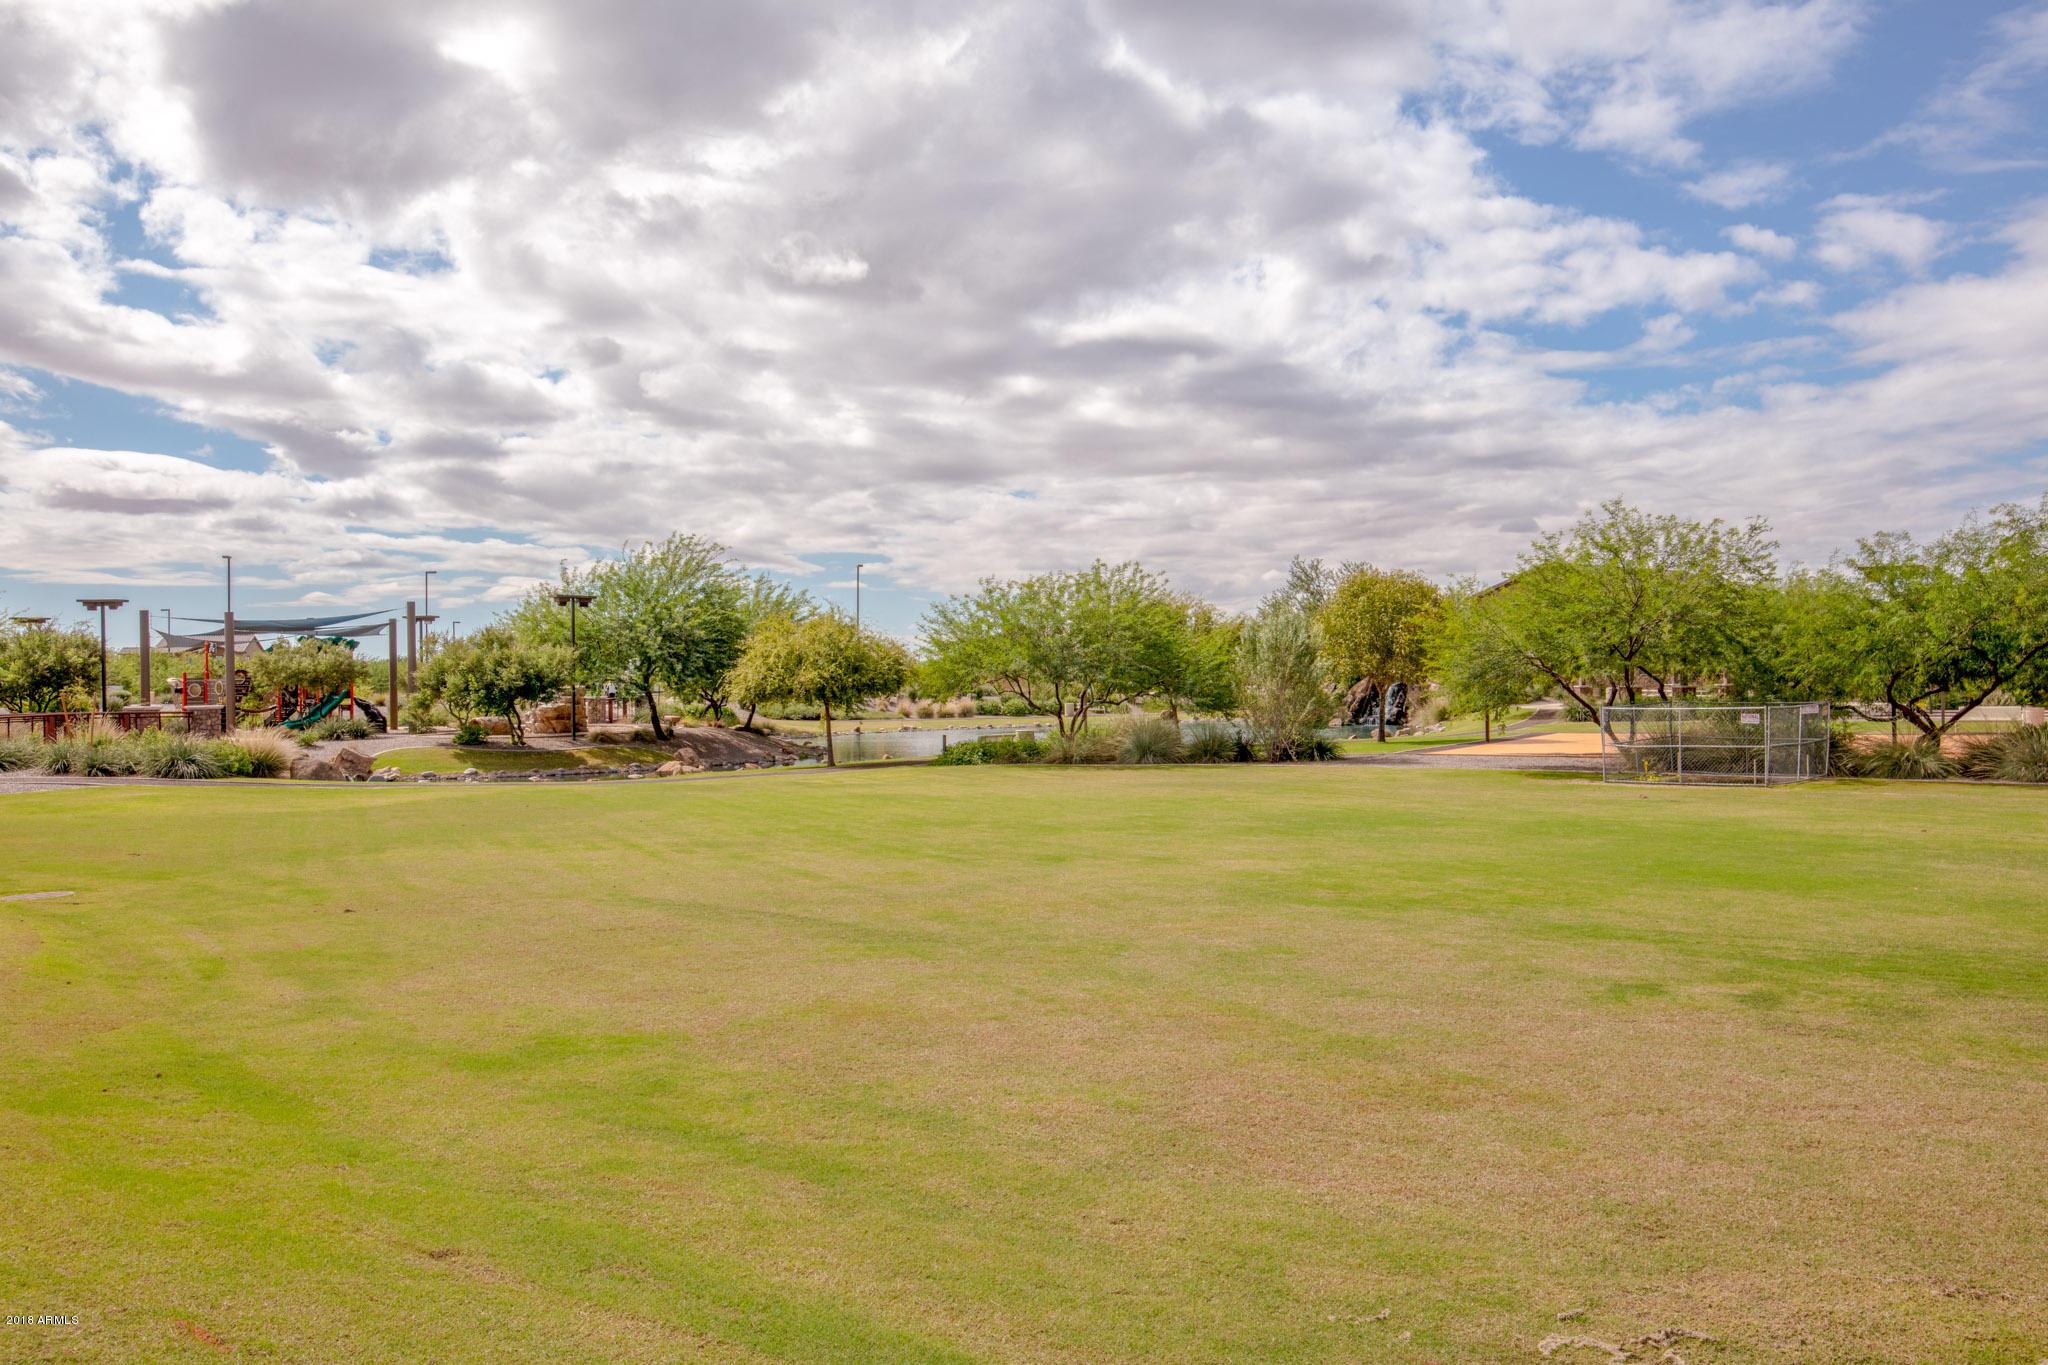 MLS 5835318 4917 S SOBOBA Street, Gilbert, AZ 85298 3 Bedroom Homes